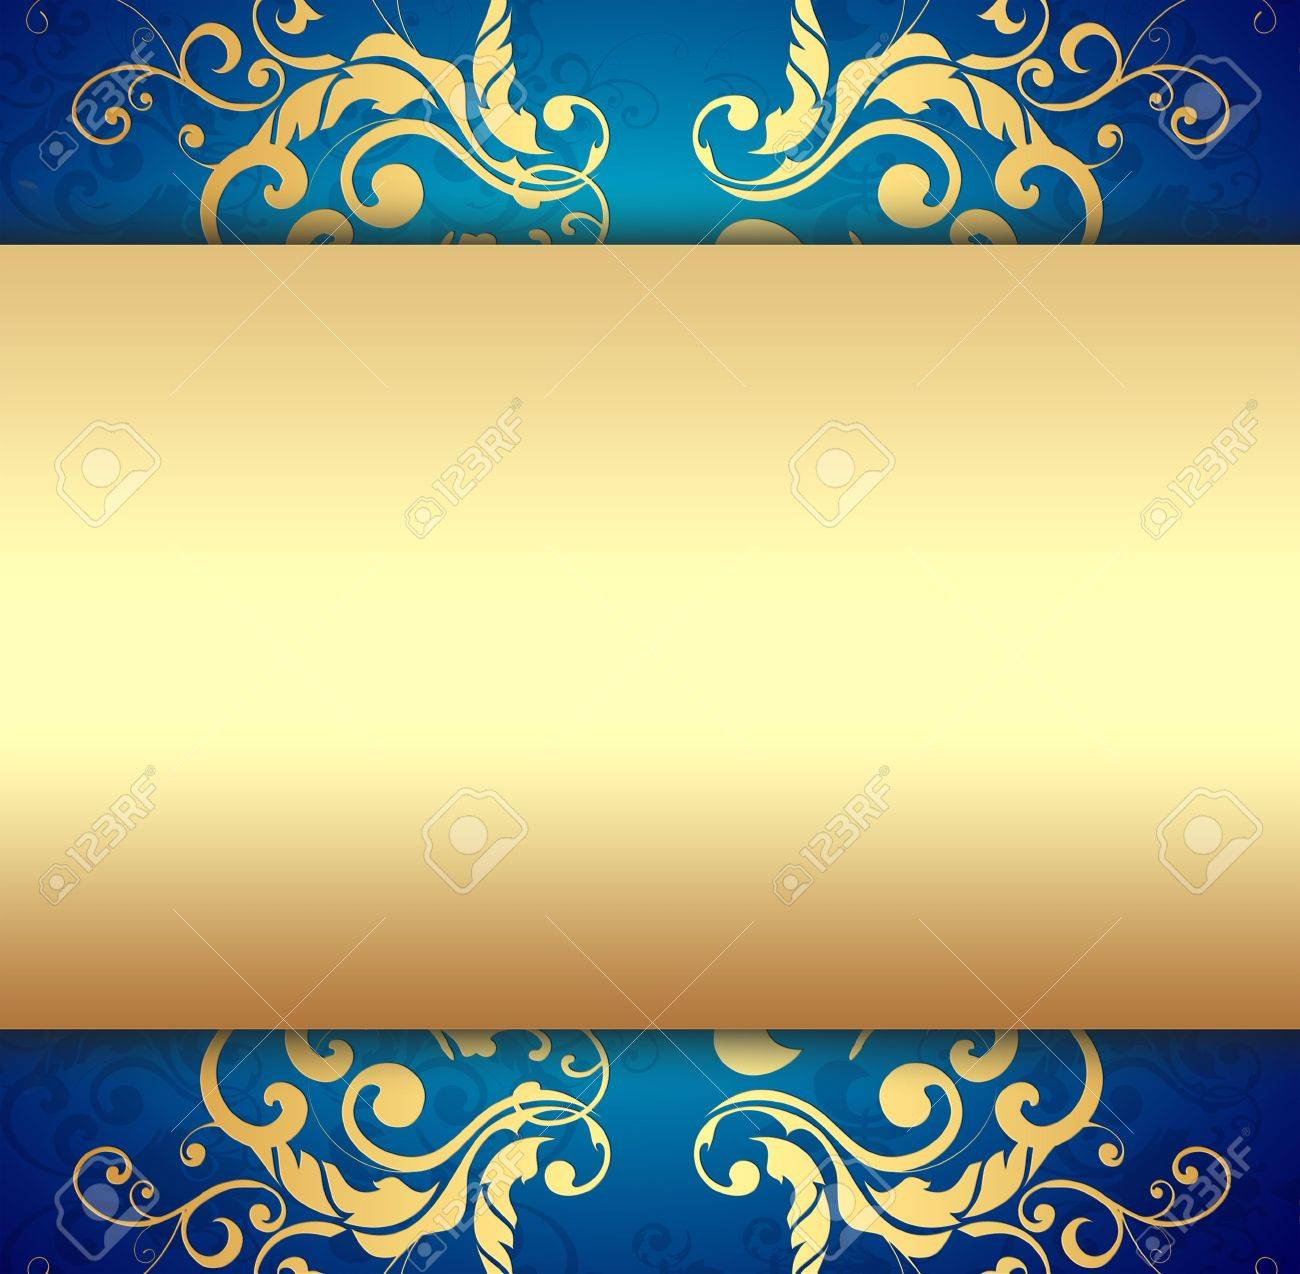 Decorative Golden Background Stock Photo - 6822672